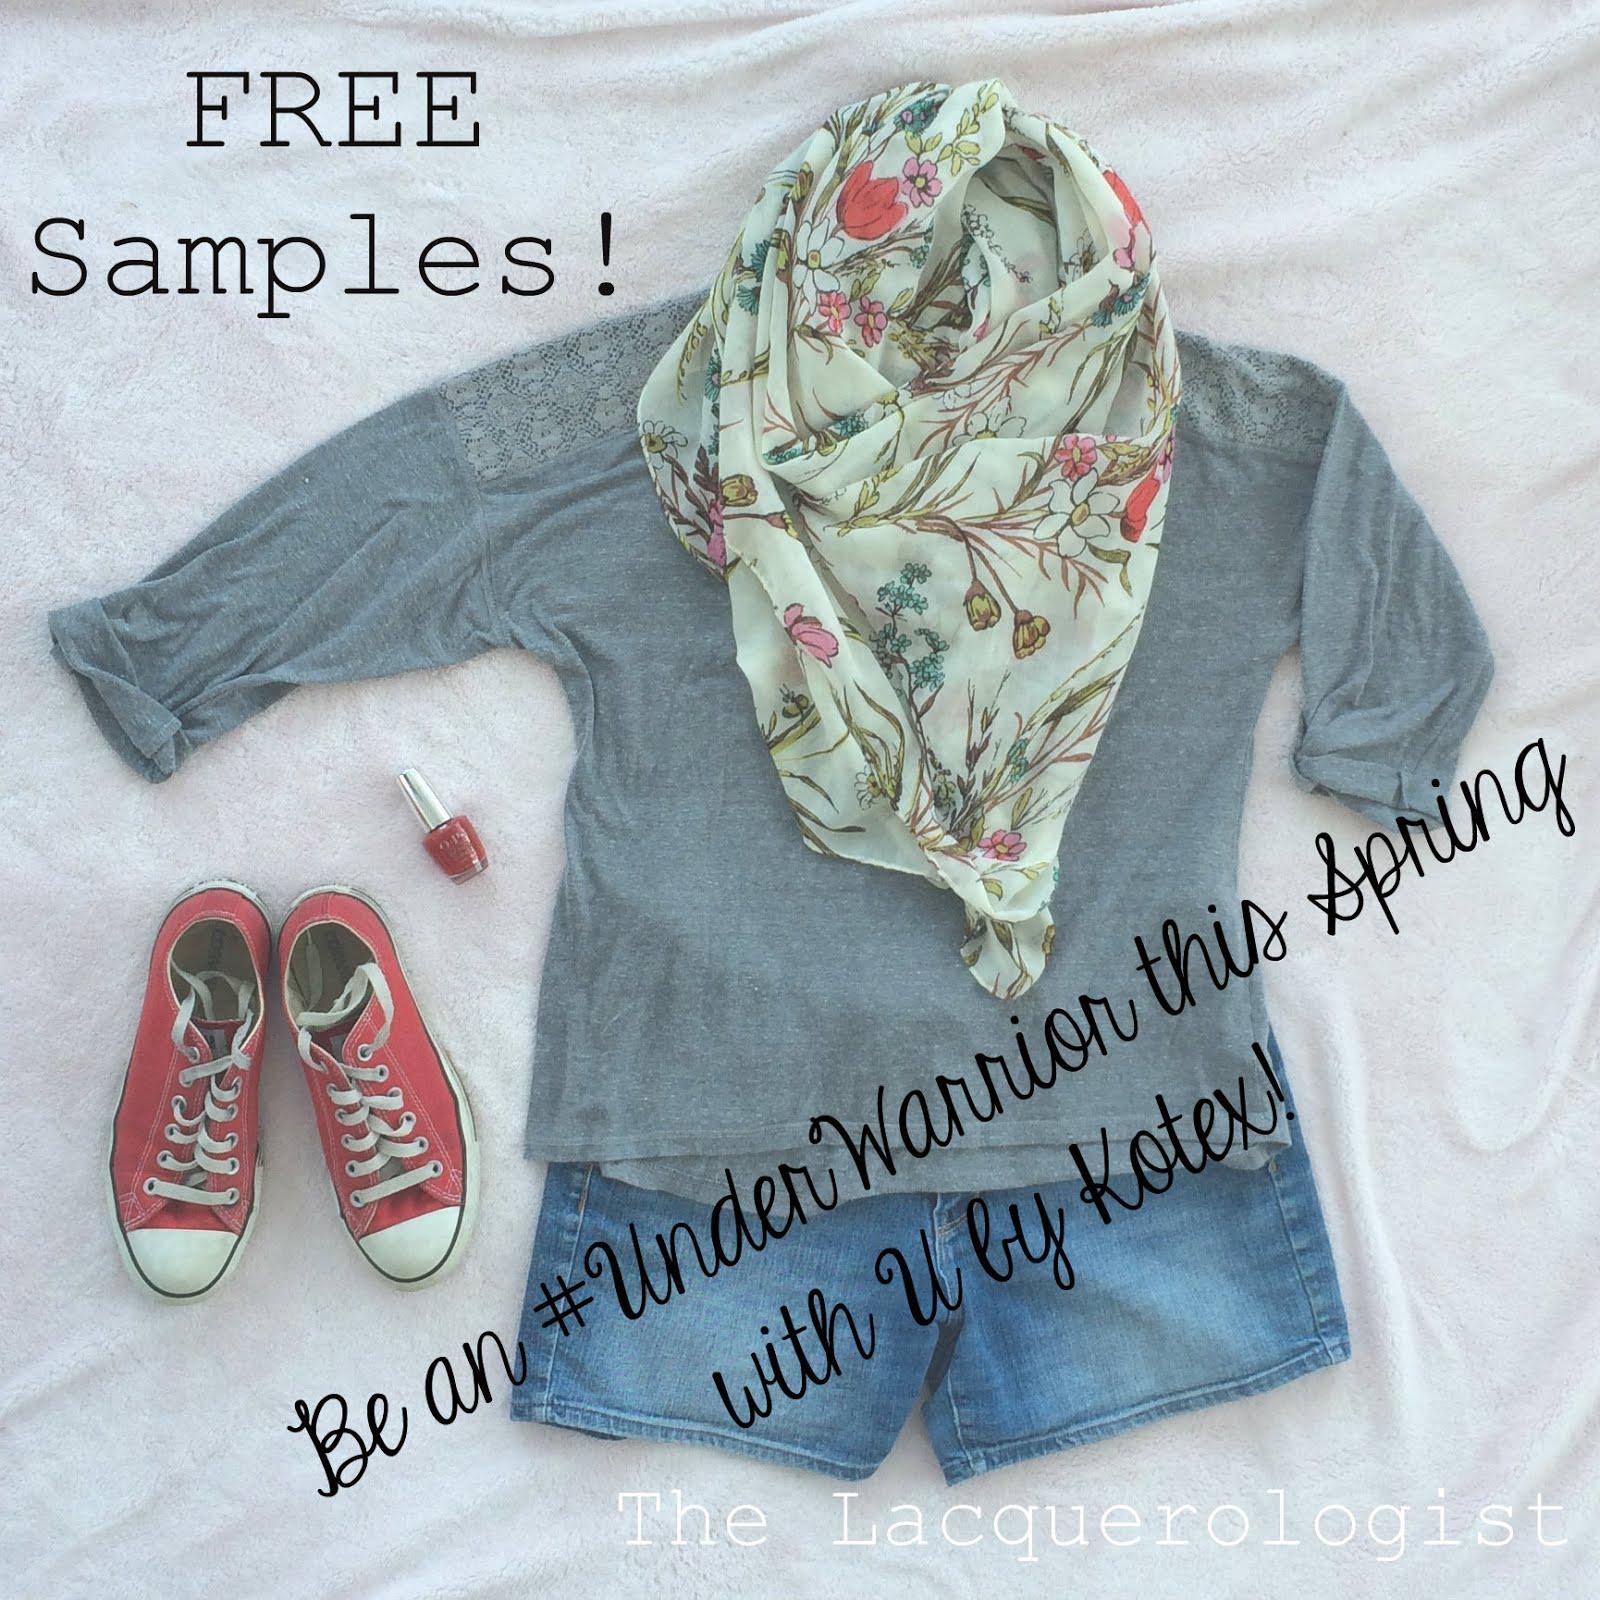 Free samples! #ad